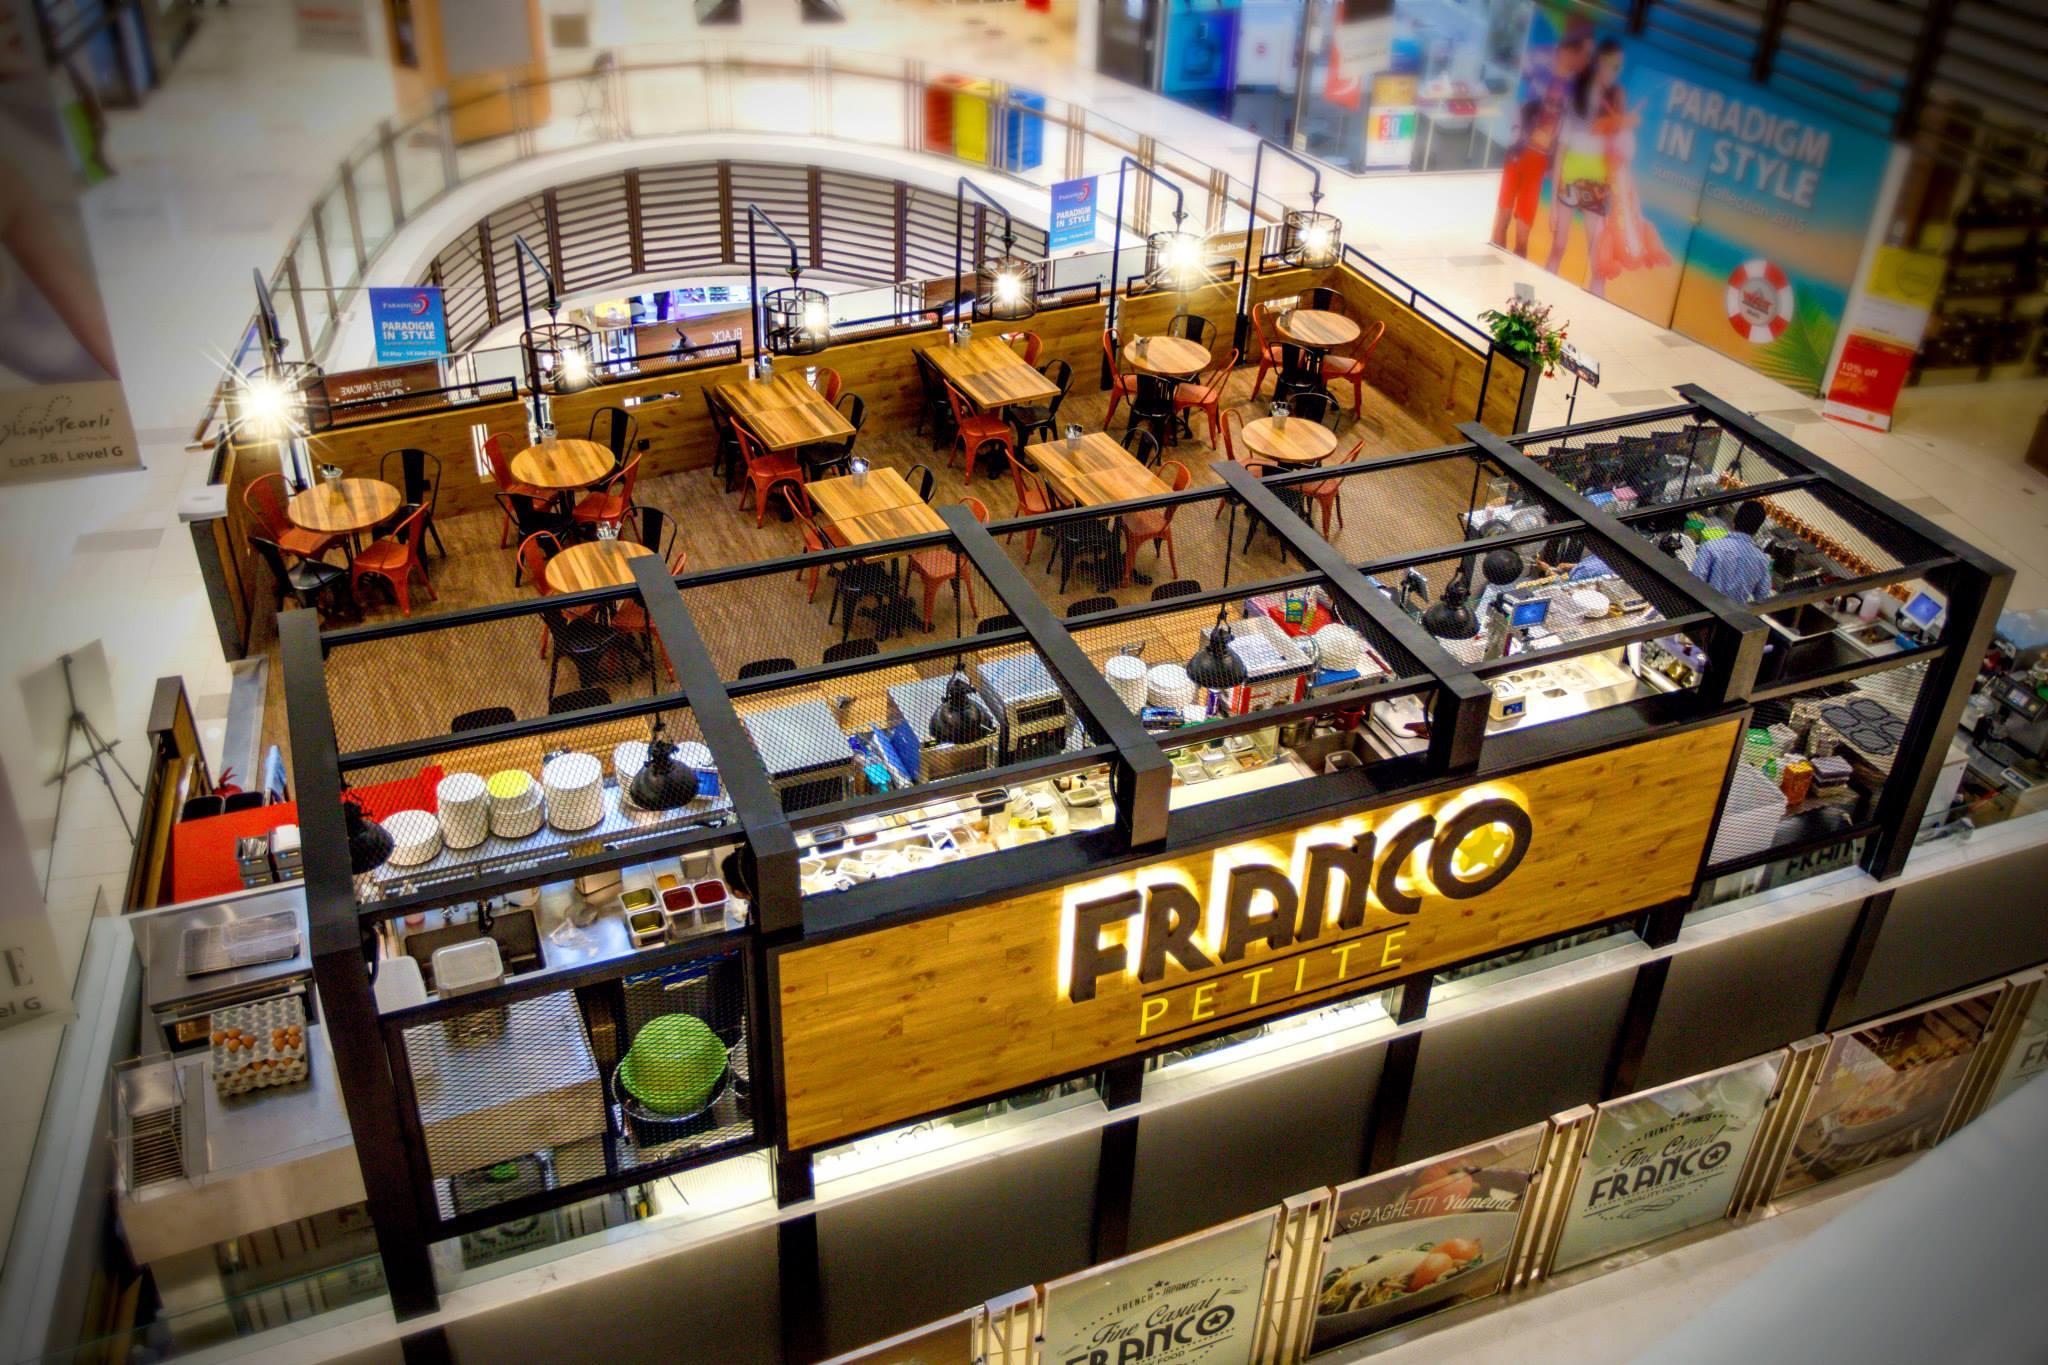 Franco Petite Paradigm Mall